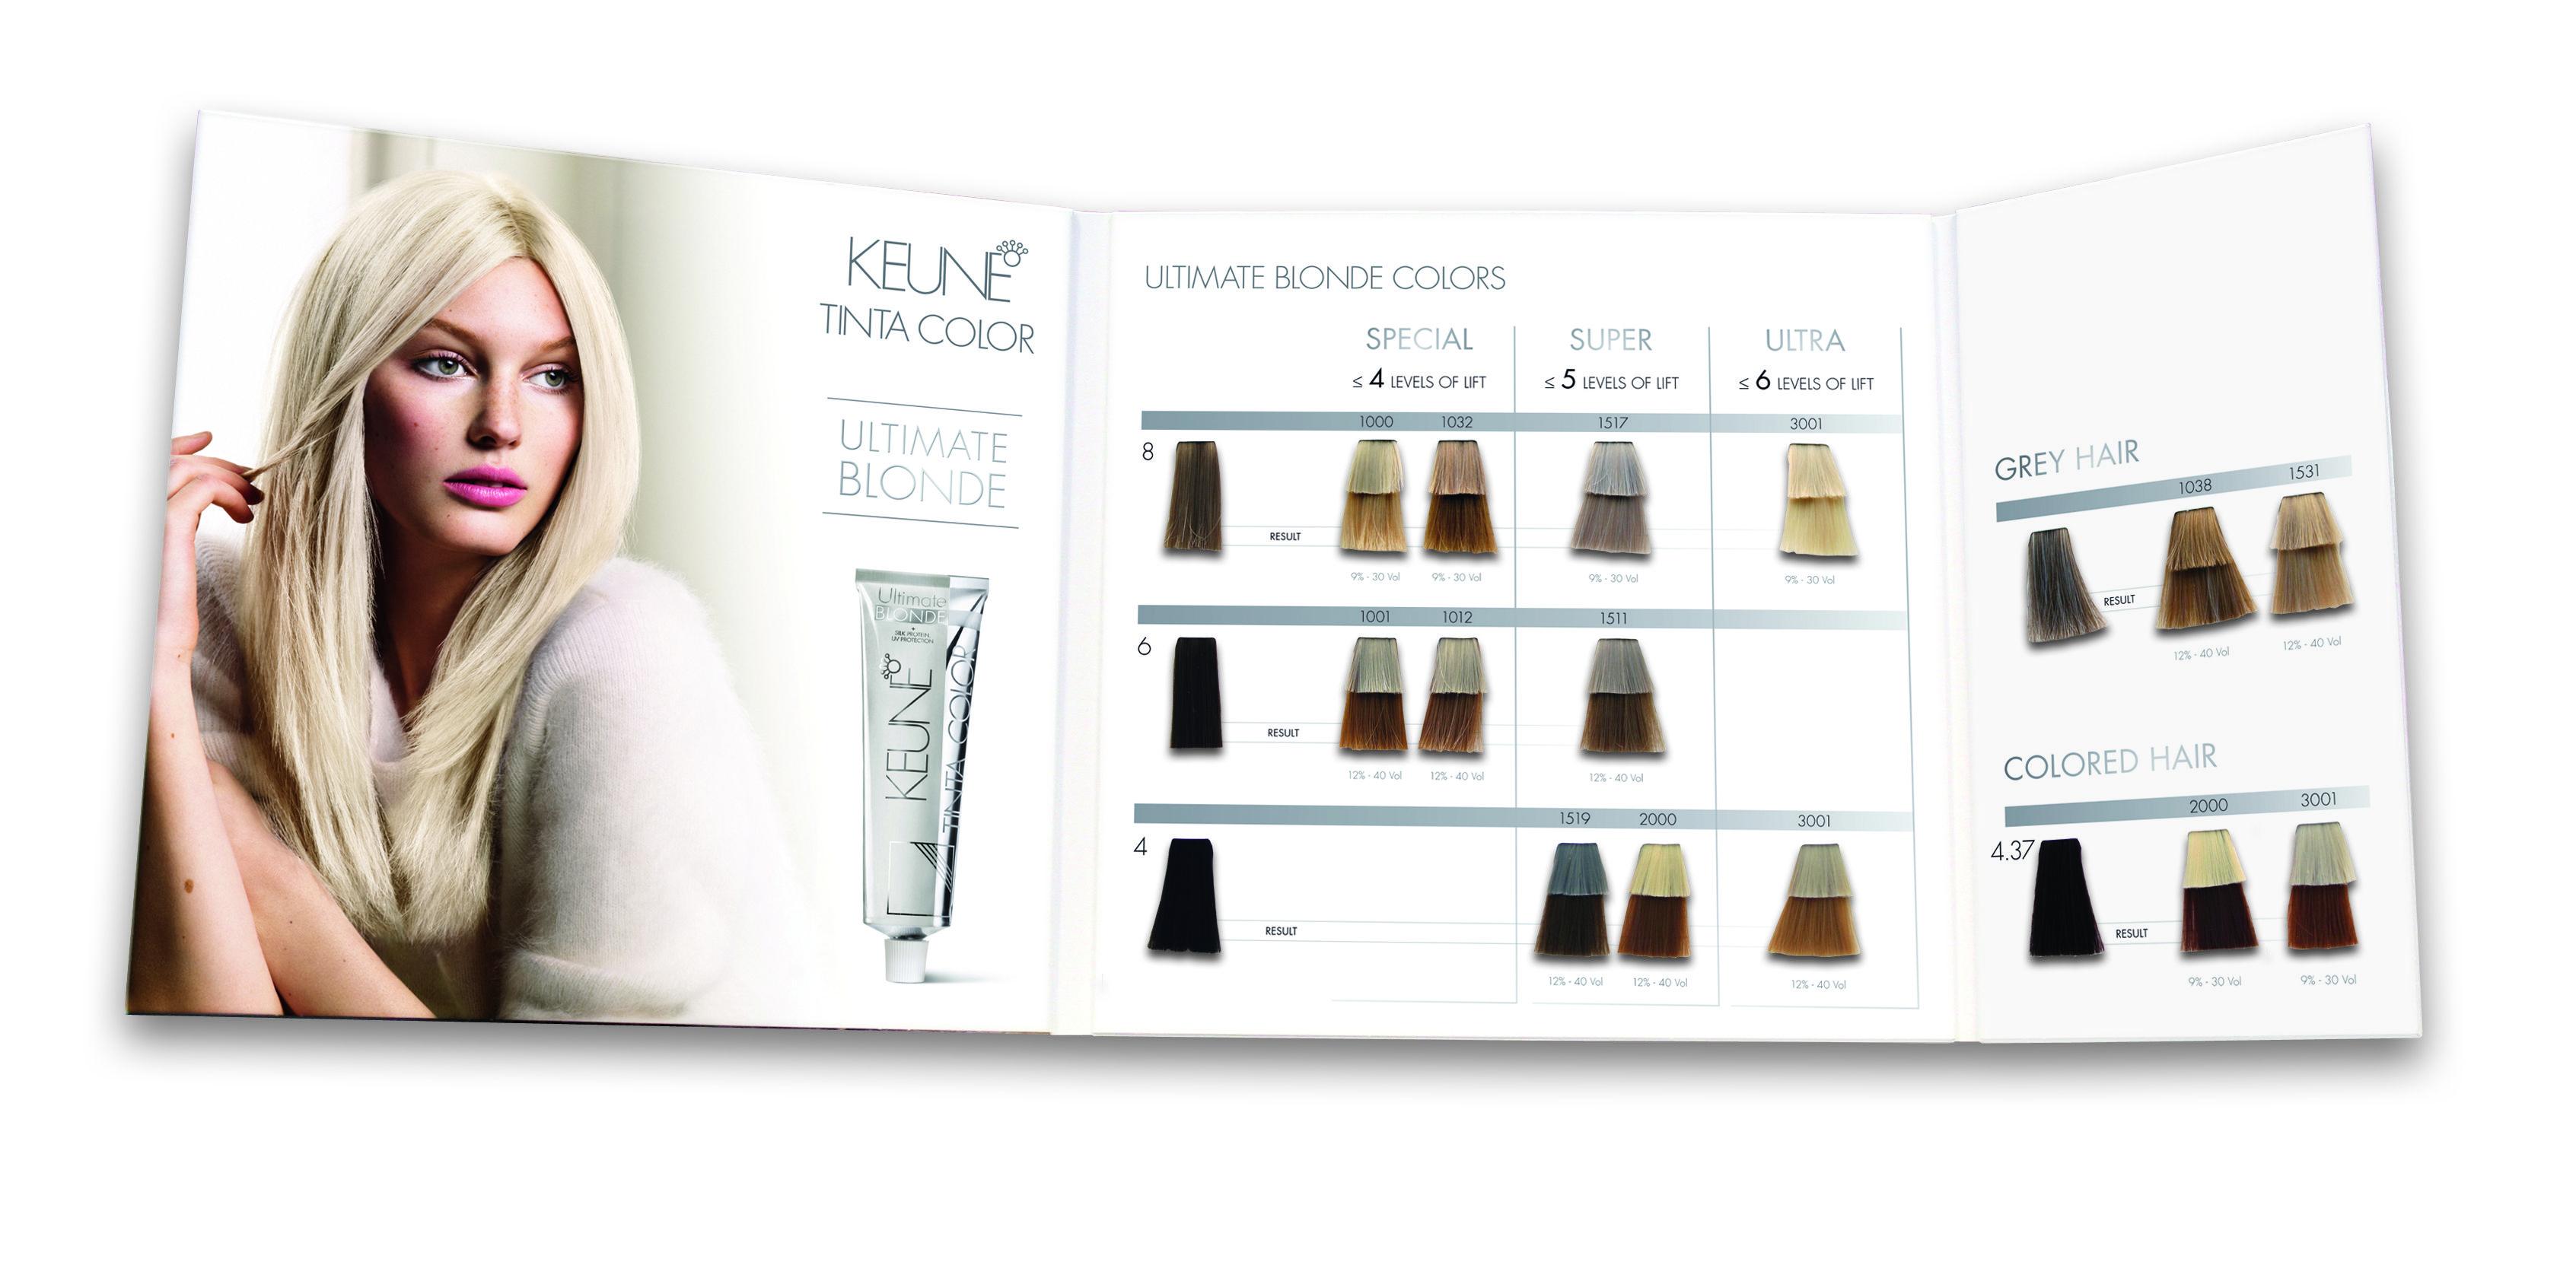 Keune Tinta Color Ultimate Blonde Swatch Book Hair Color Chart Hair Color Blonde Color Chart